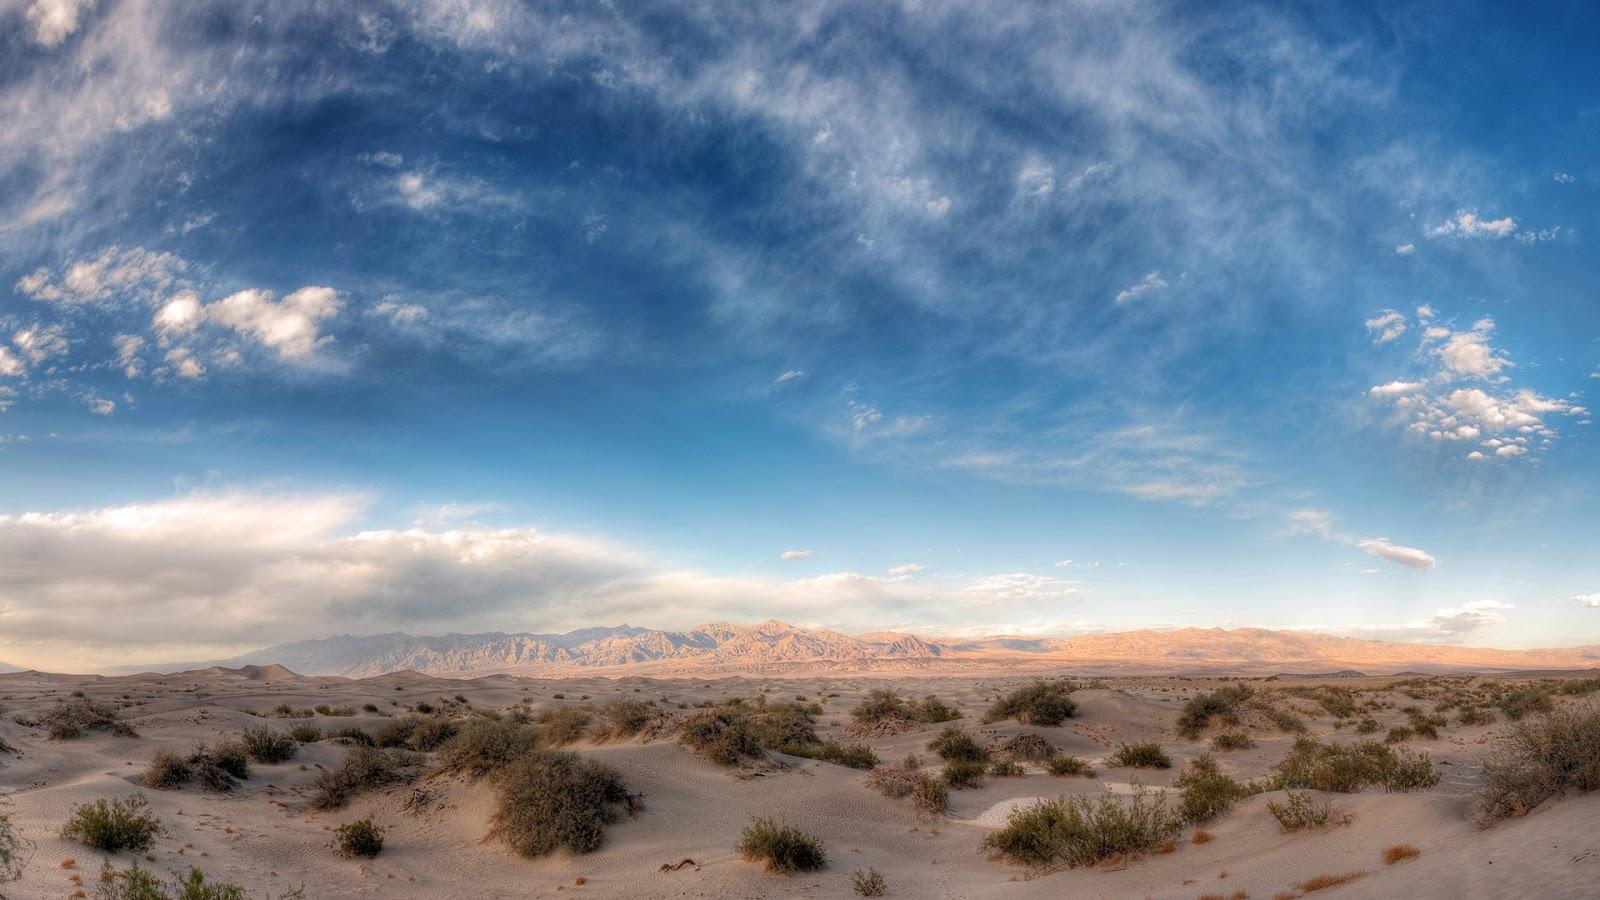 Sandy Desert Mountain